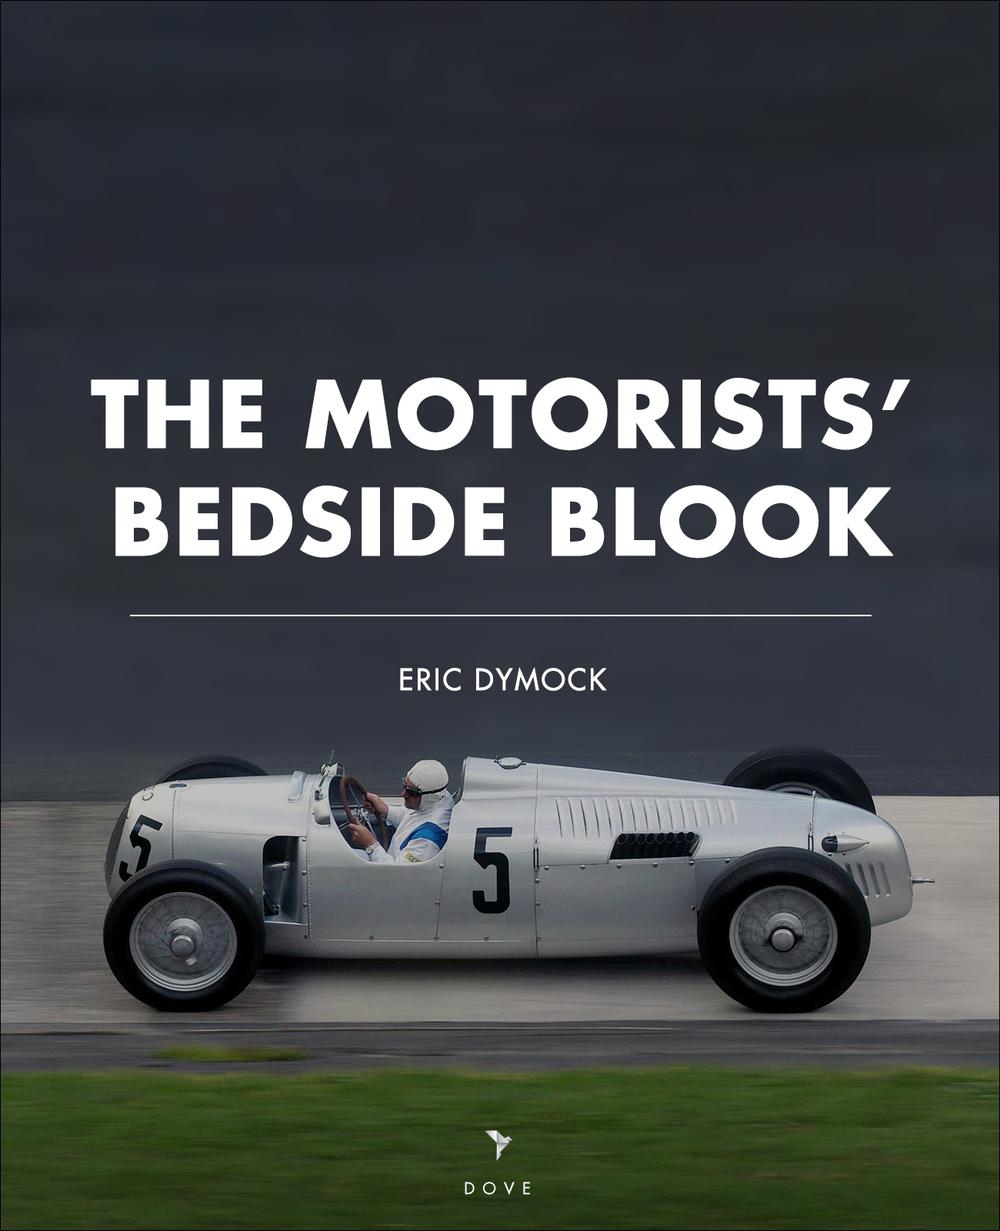 The Motorists' Bedside Blook